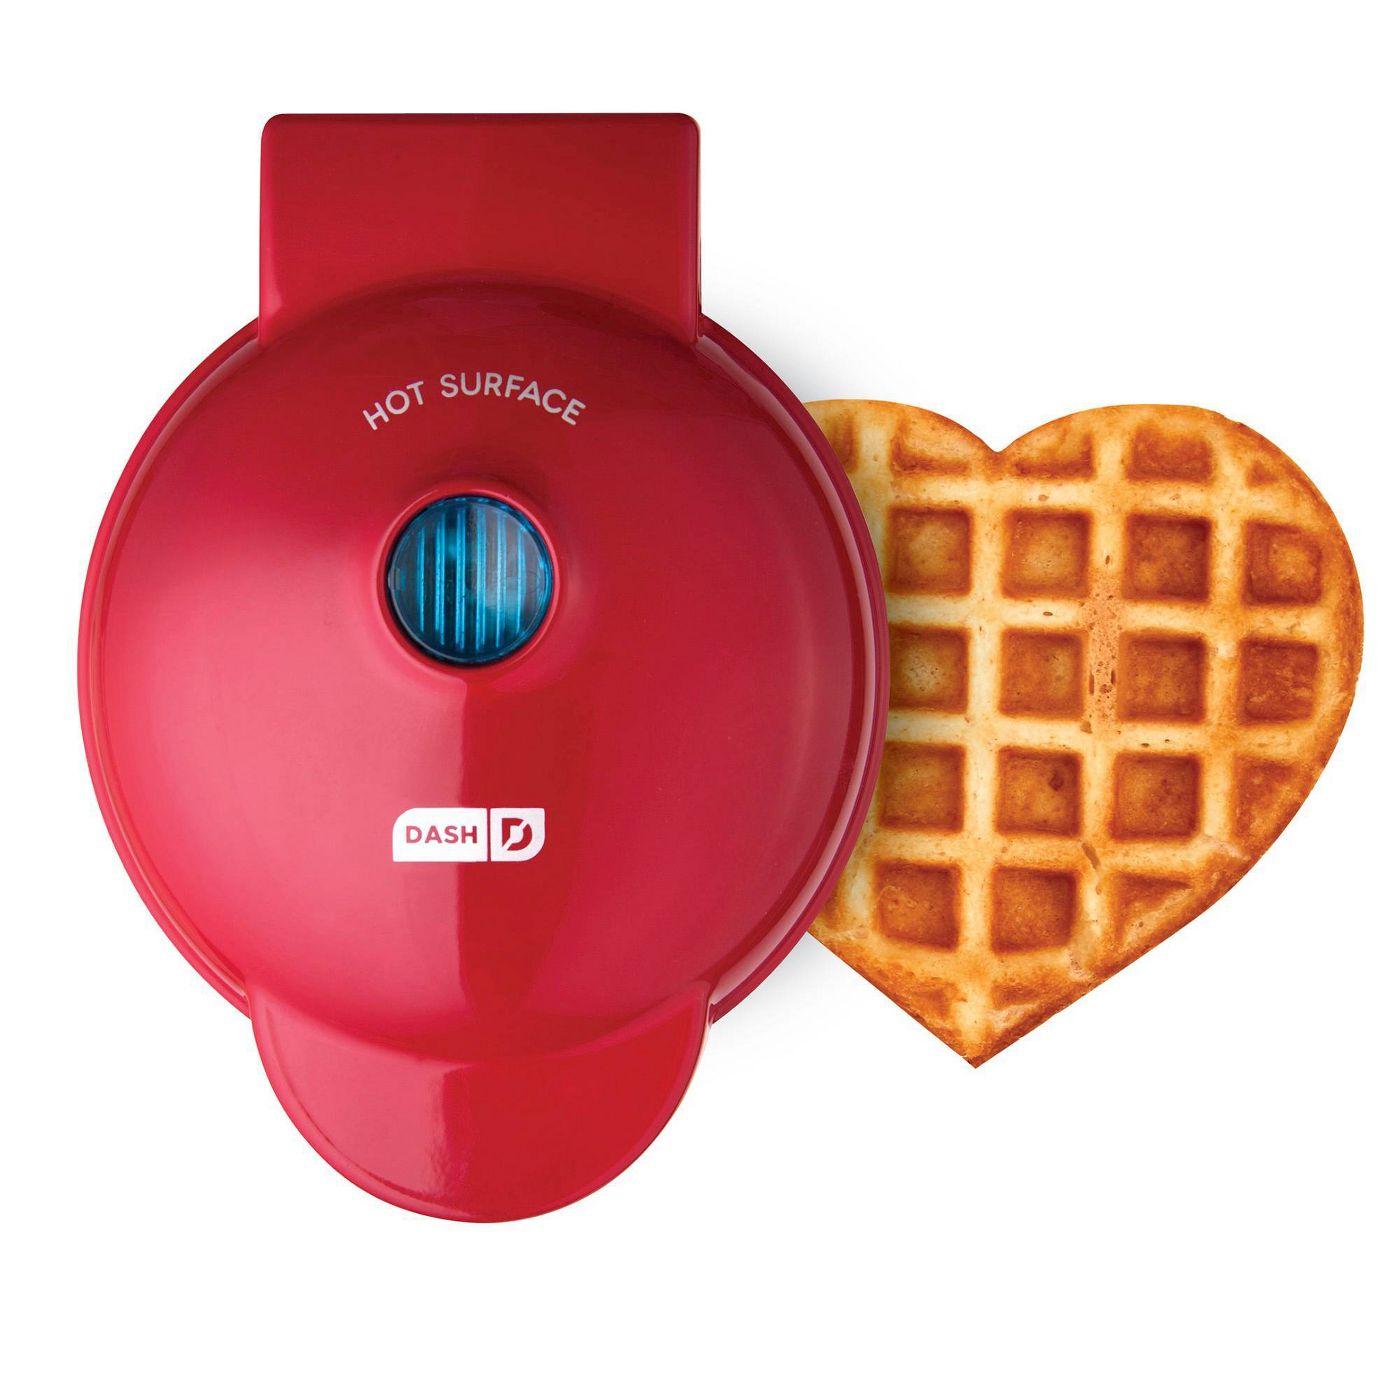 Dash Heart Mini Waffle Maker - image 1 of 6